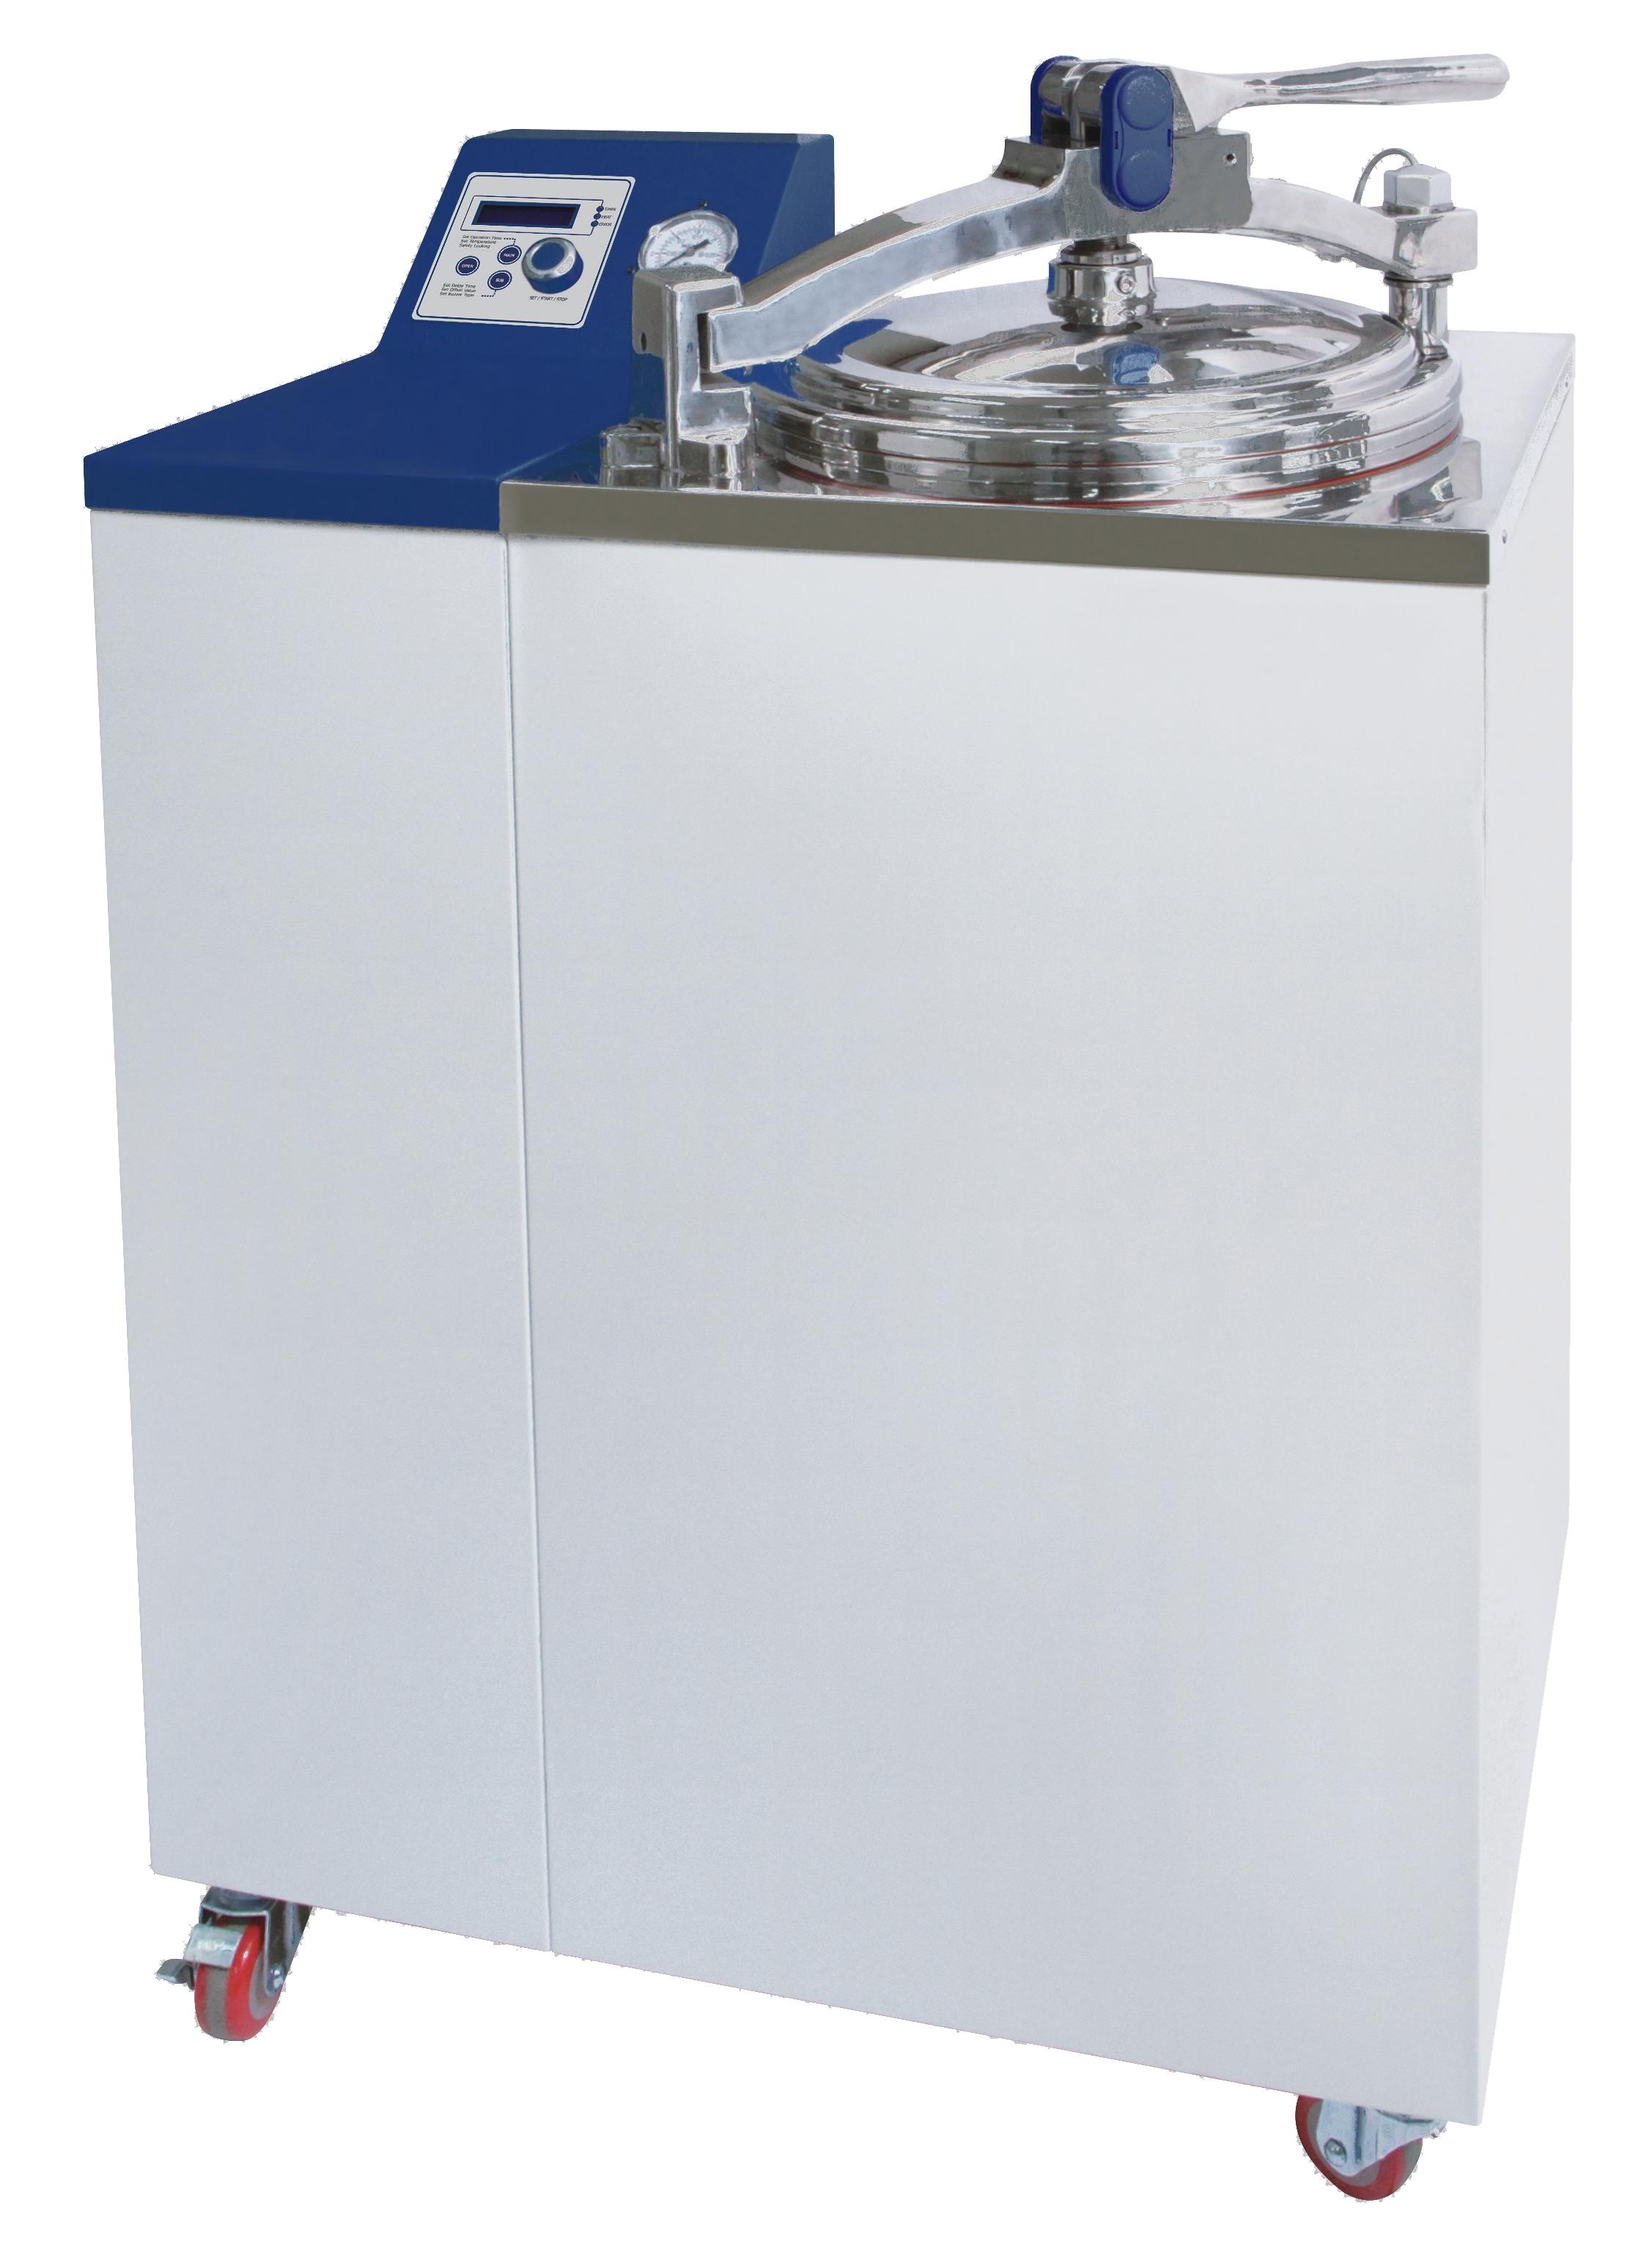 Autoclave Wac 47 60 80 Liter 121 176 C With Basket Witeg